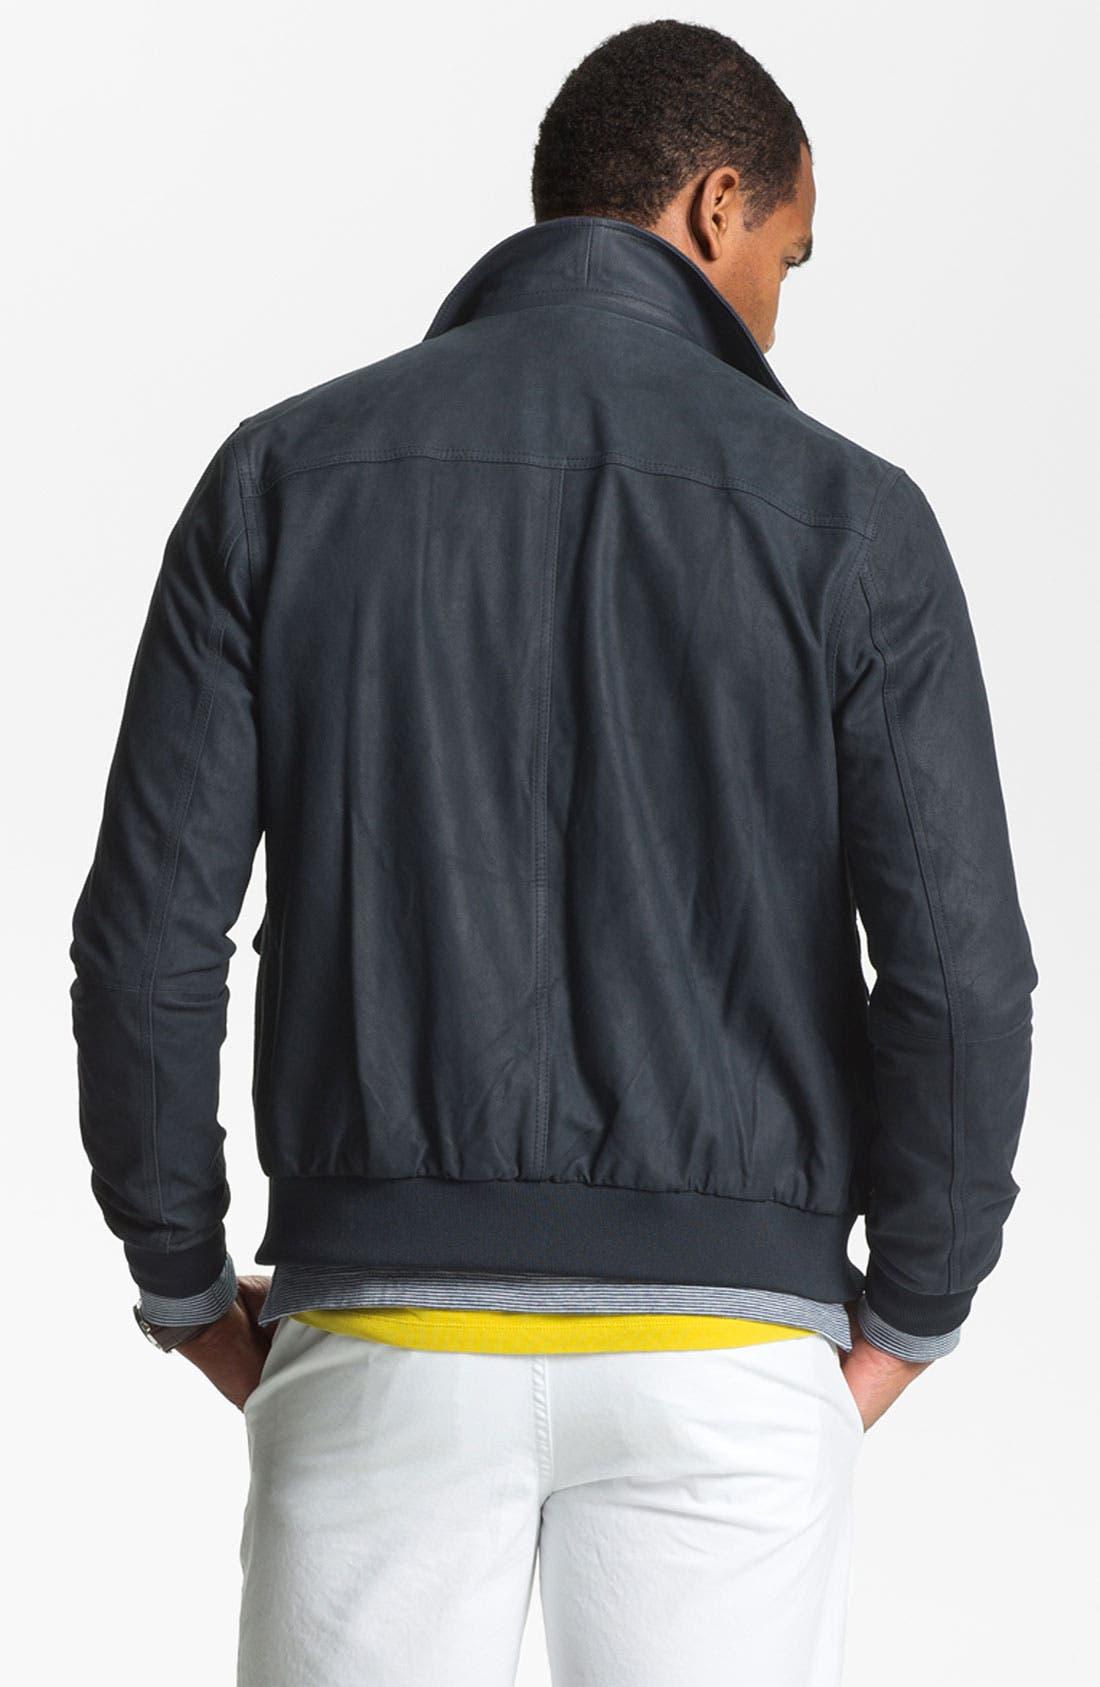 Alternate Image 2  - Michael Kors 'Lux' Suede Bomber Jacket